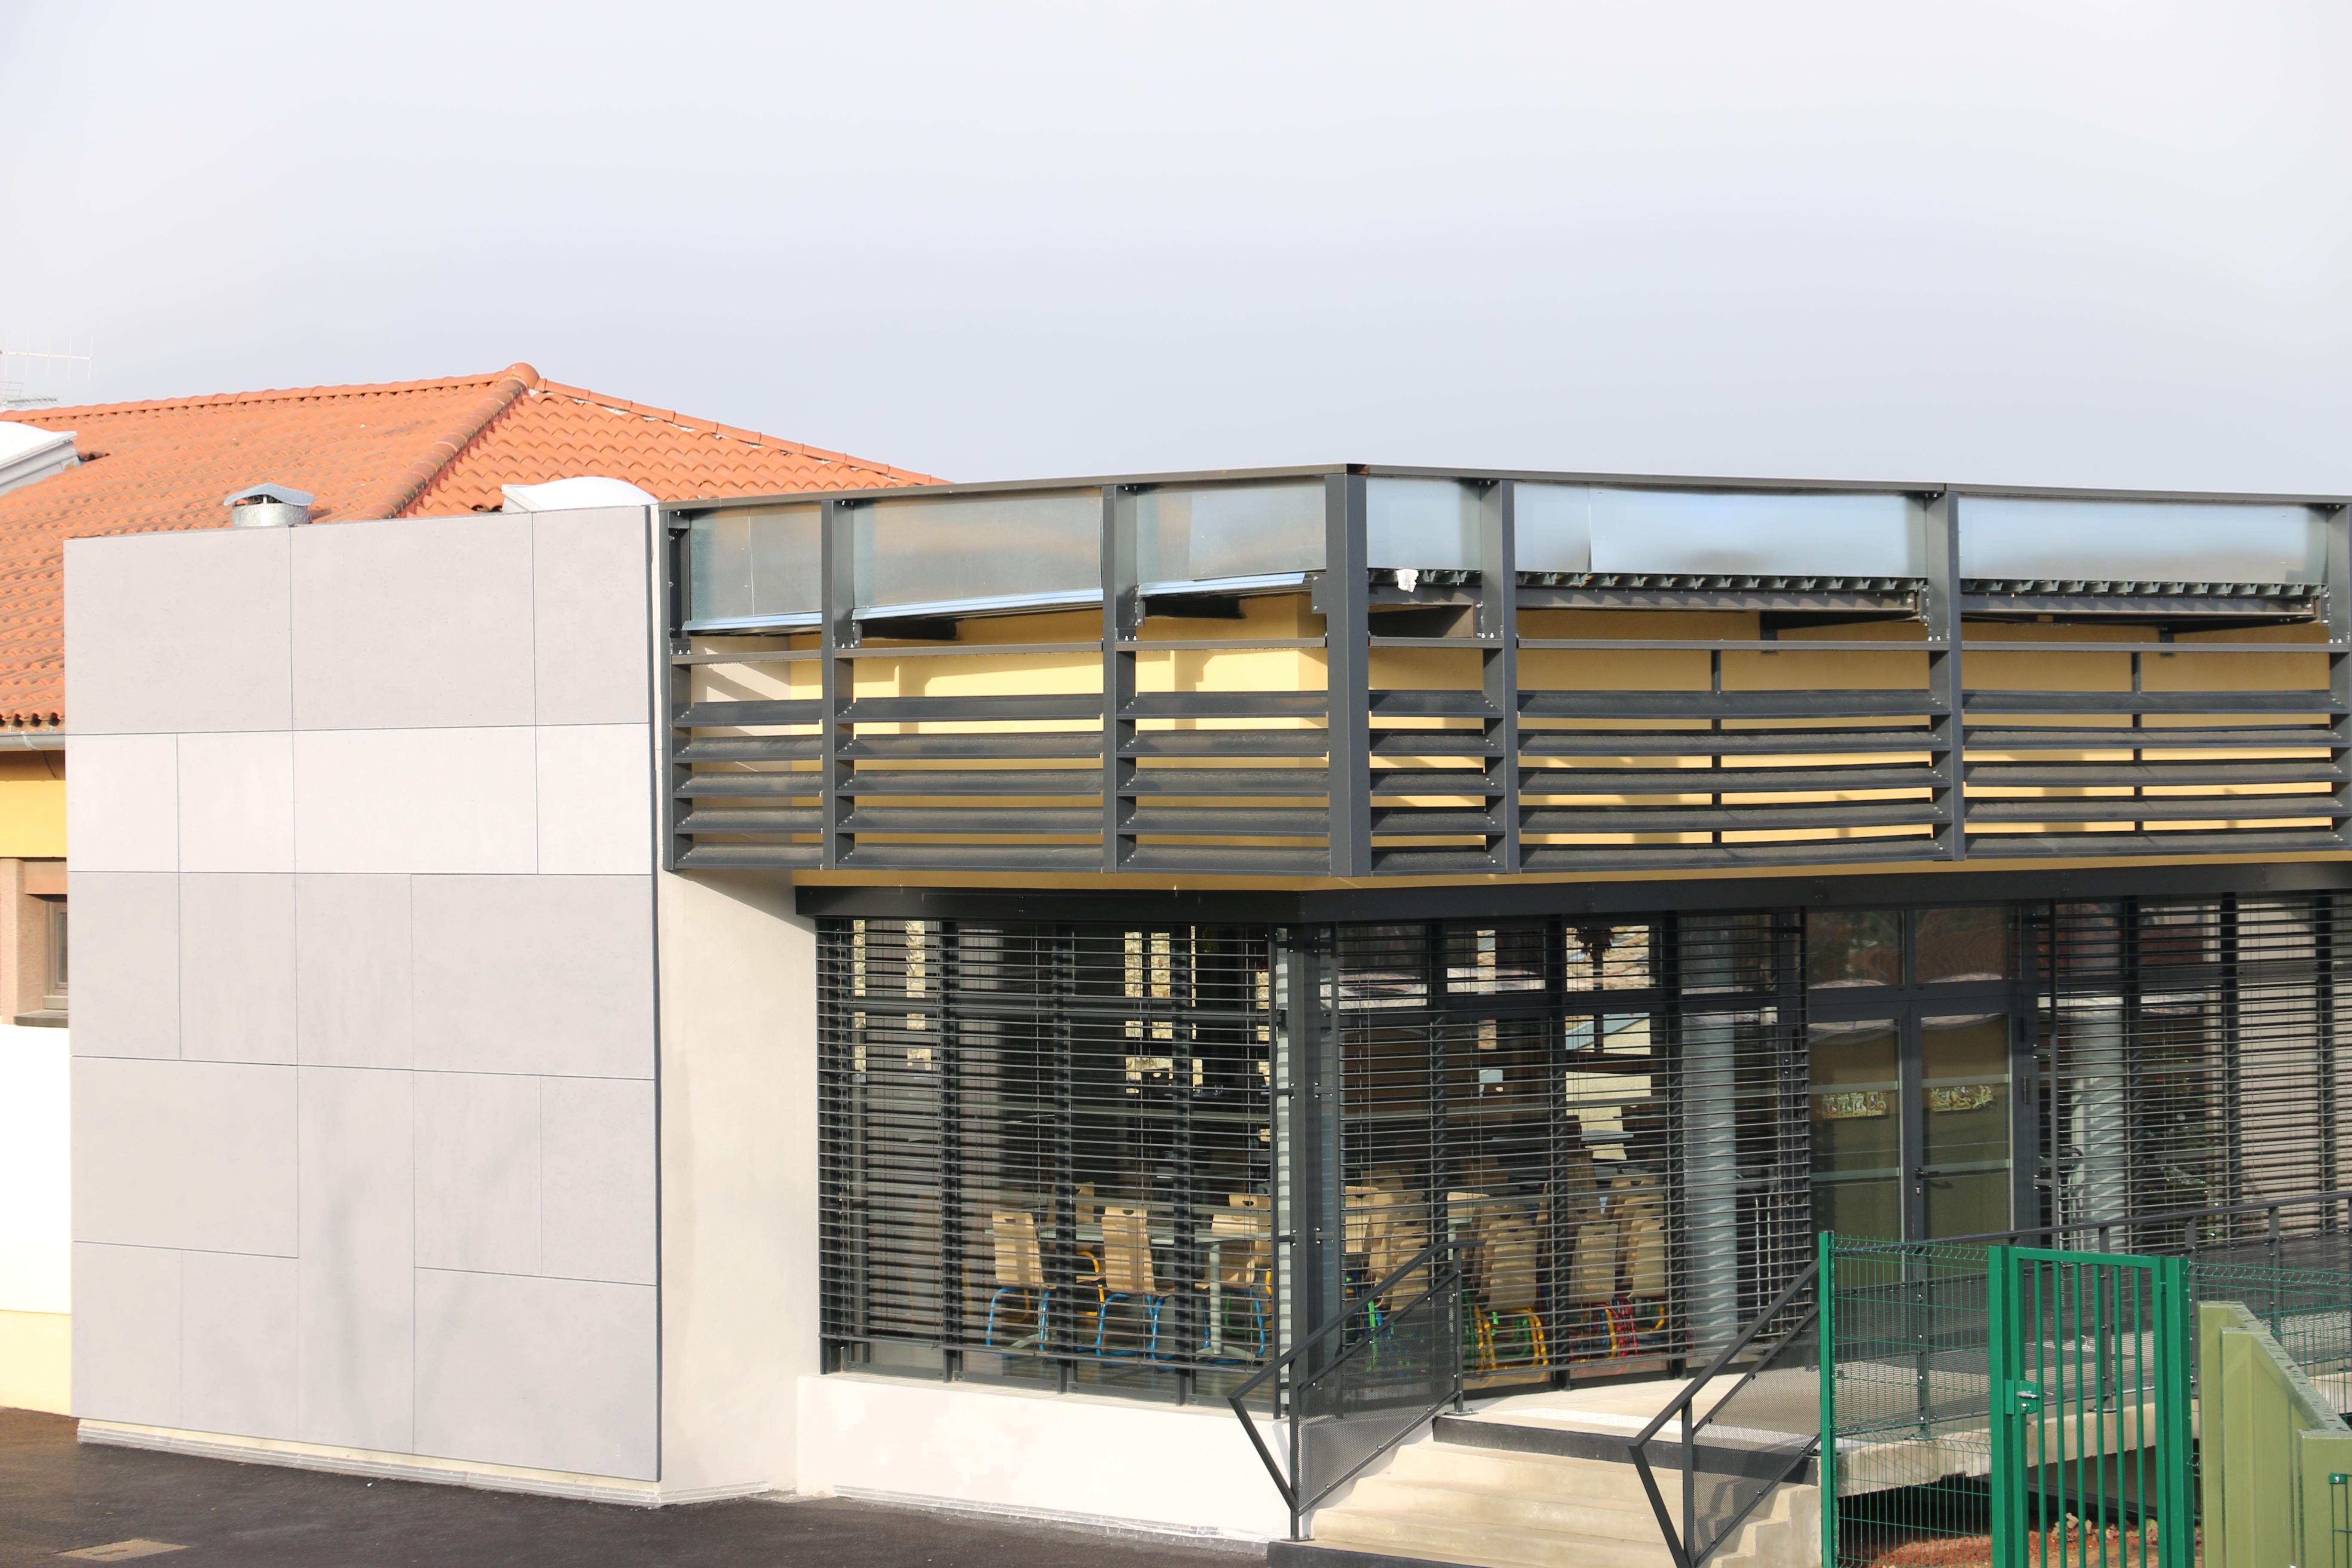 Restaurant scolaire 05.JPG